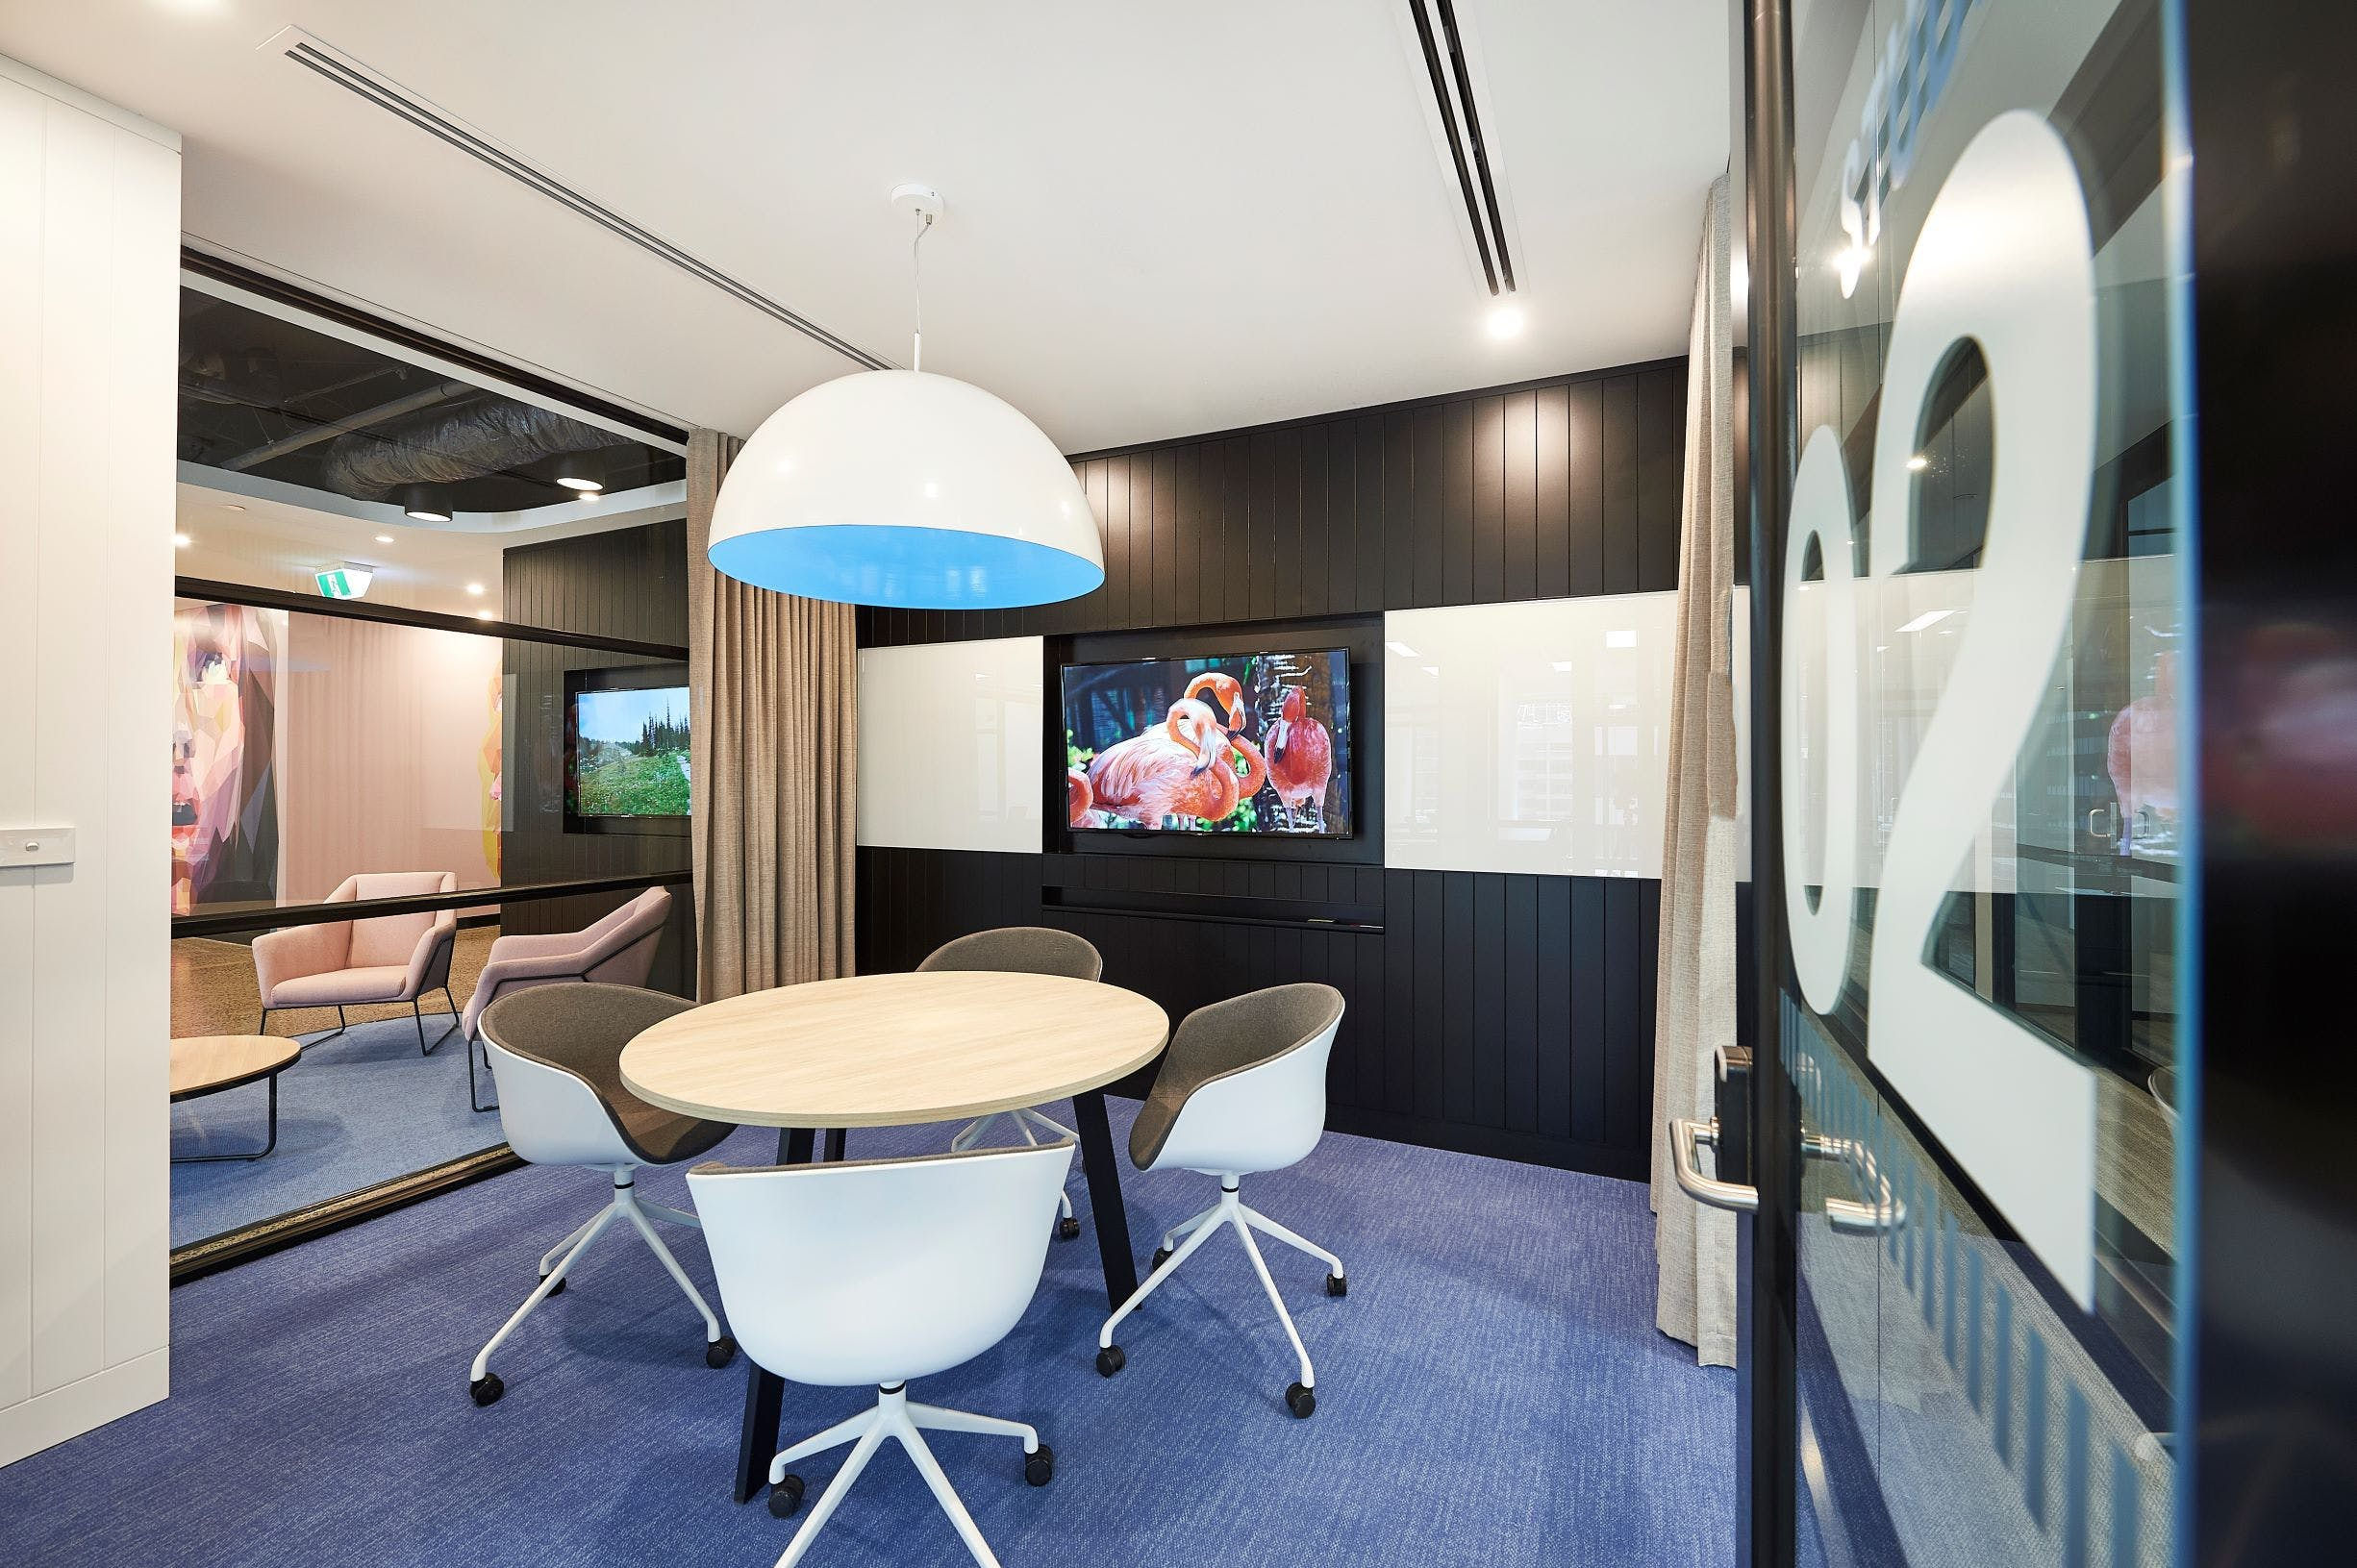 Studio 2, meeting room at Altitude CoWork, image 1